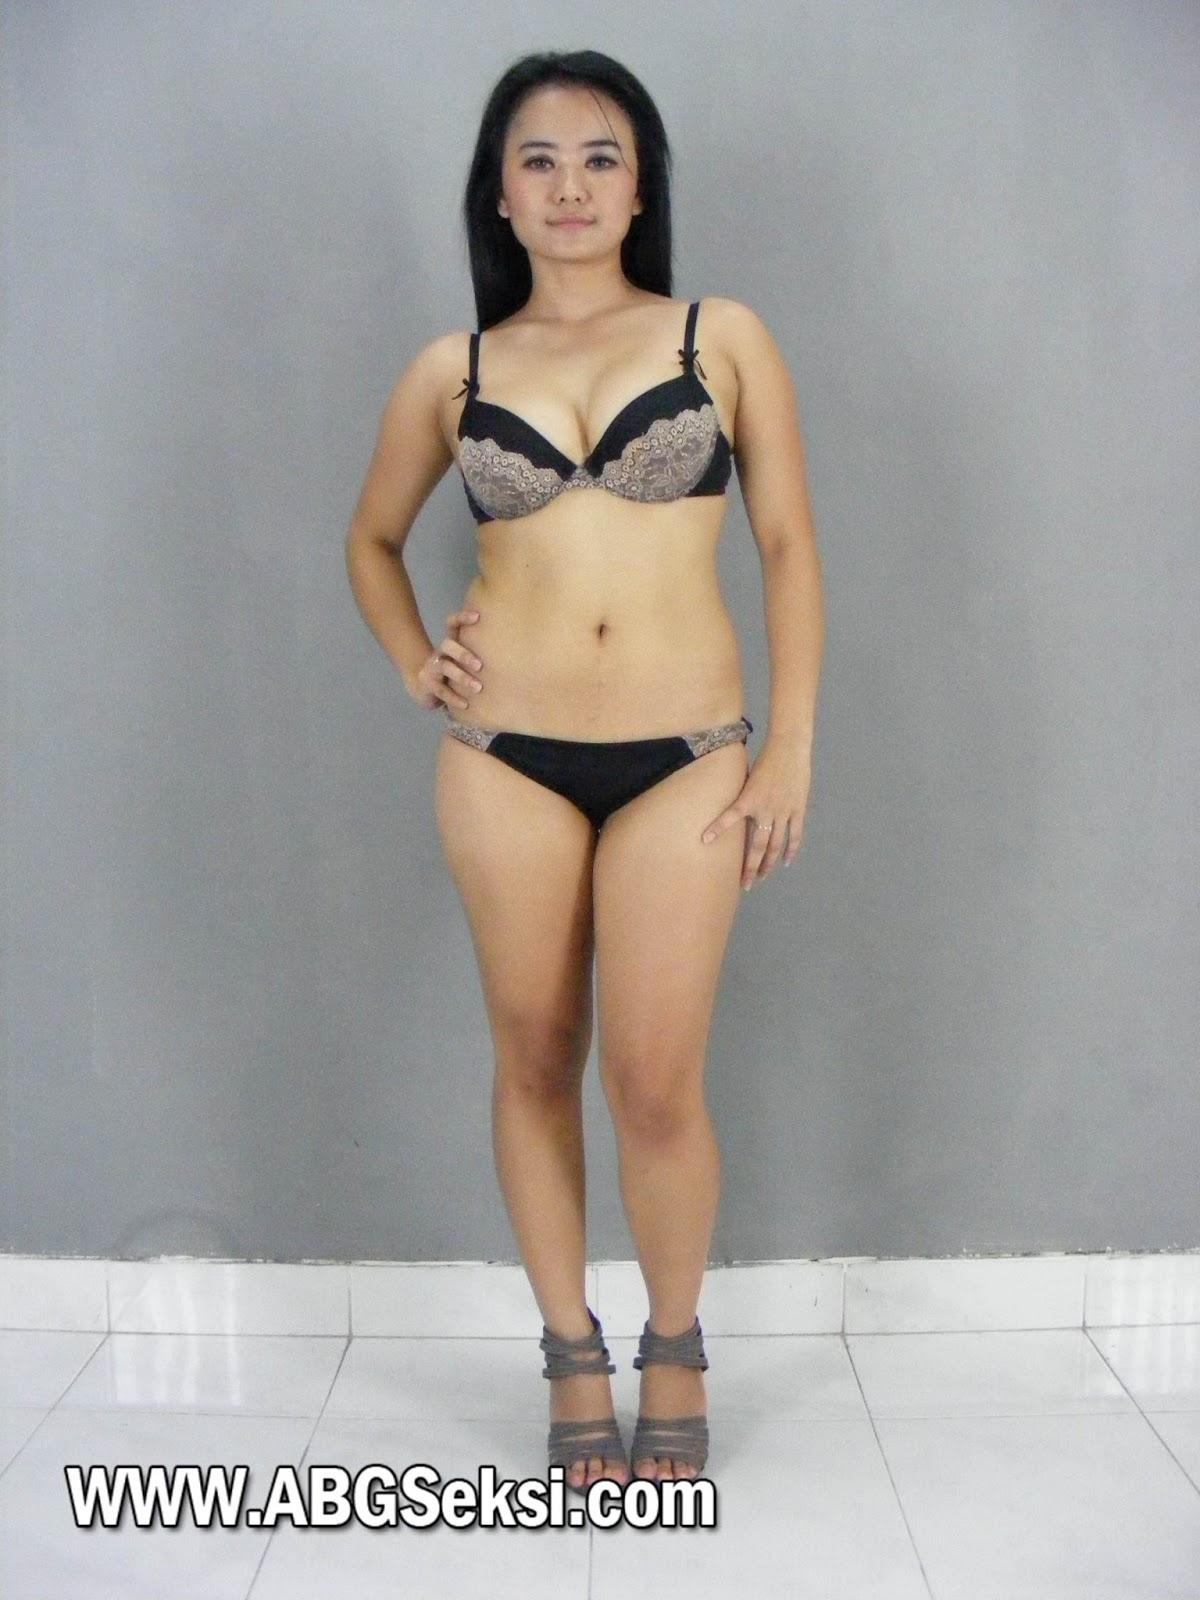 Kumpulan casting jadi model indonesia telanjang | ABGSeksi.com